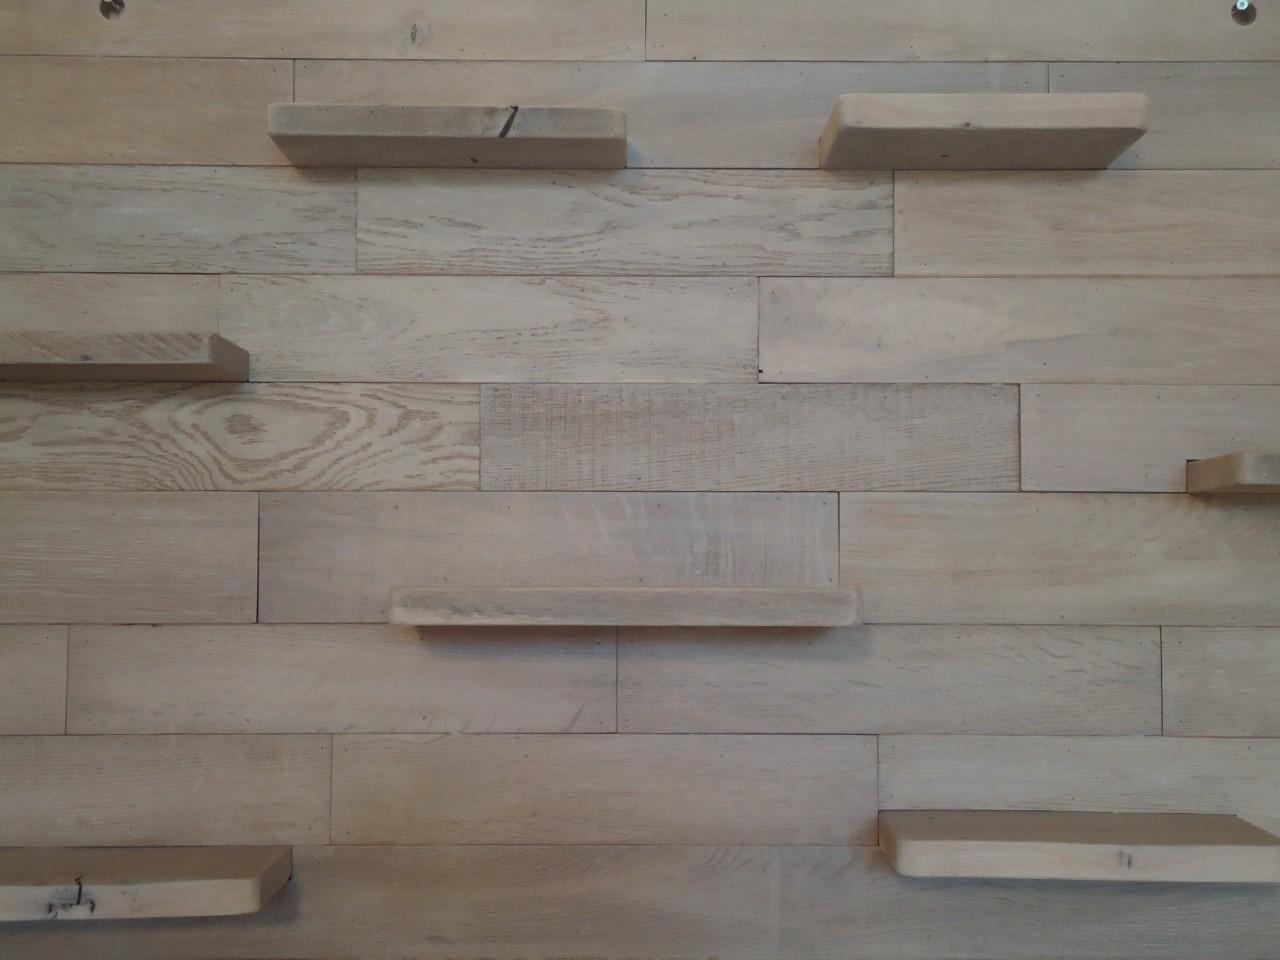 Wand Maken In Hout : Wandbekleding van hout - RobuusteMeubels.nl